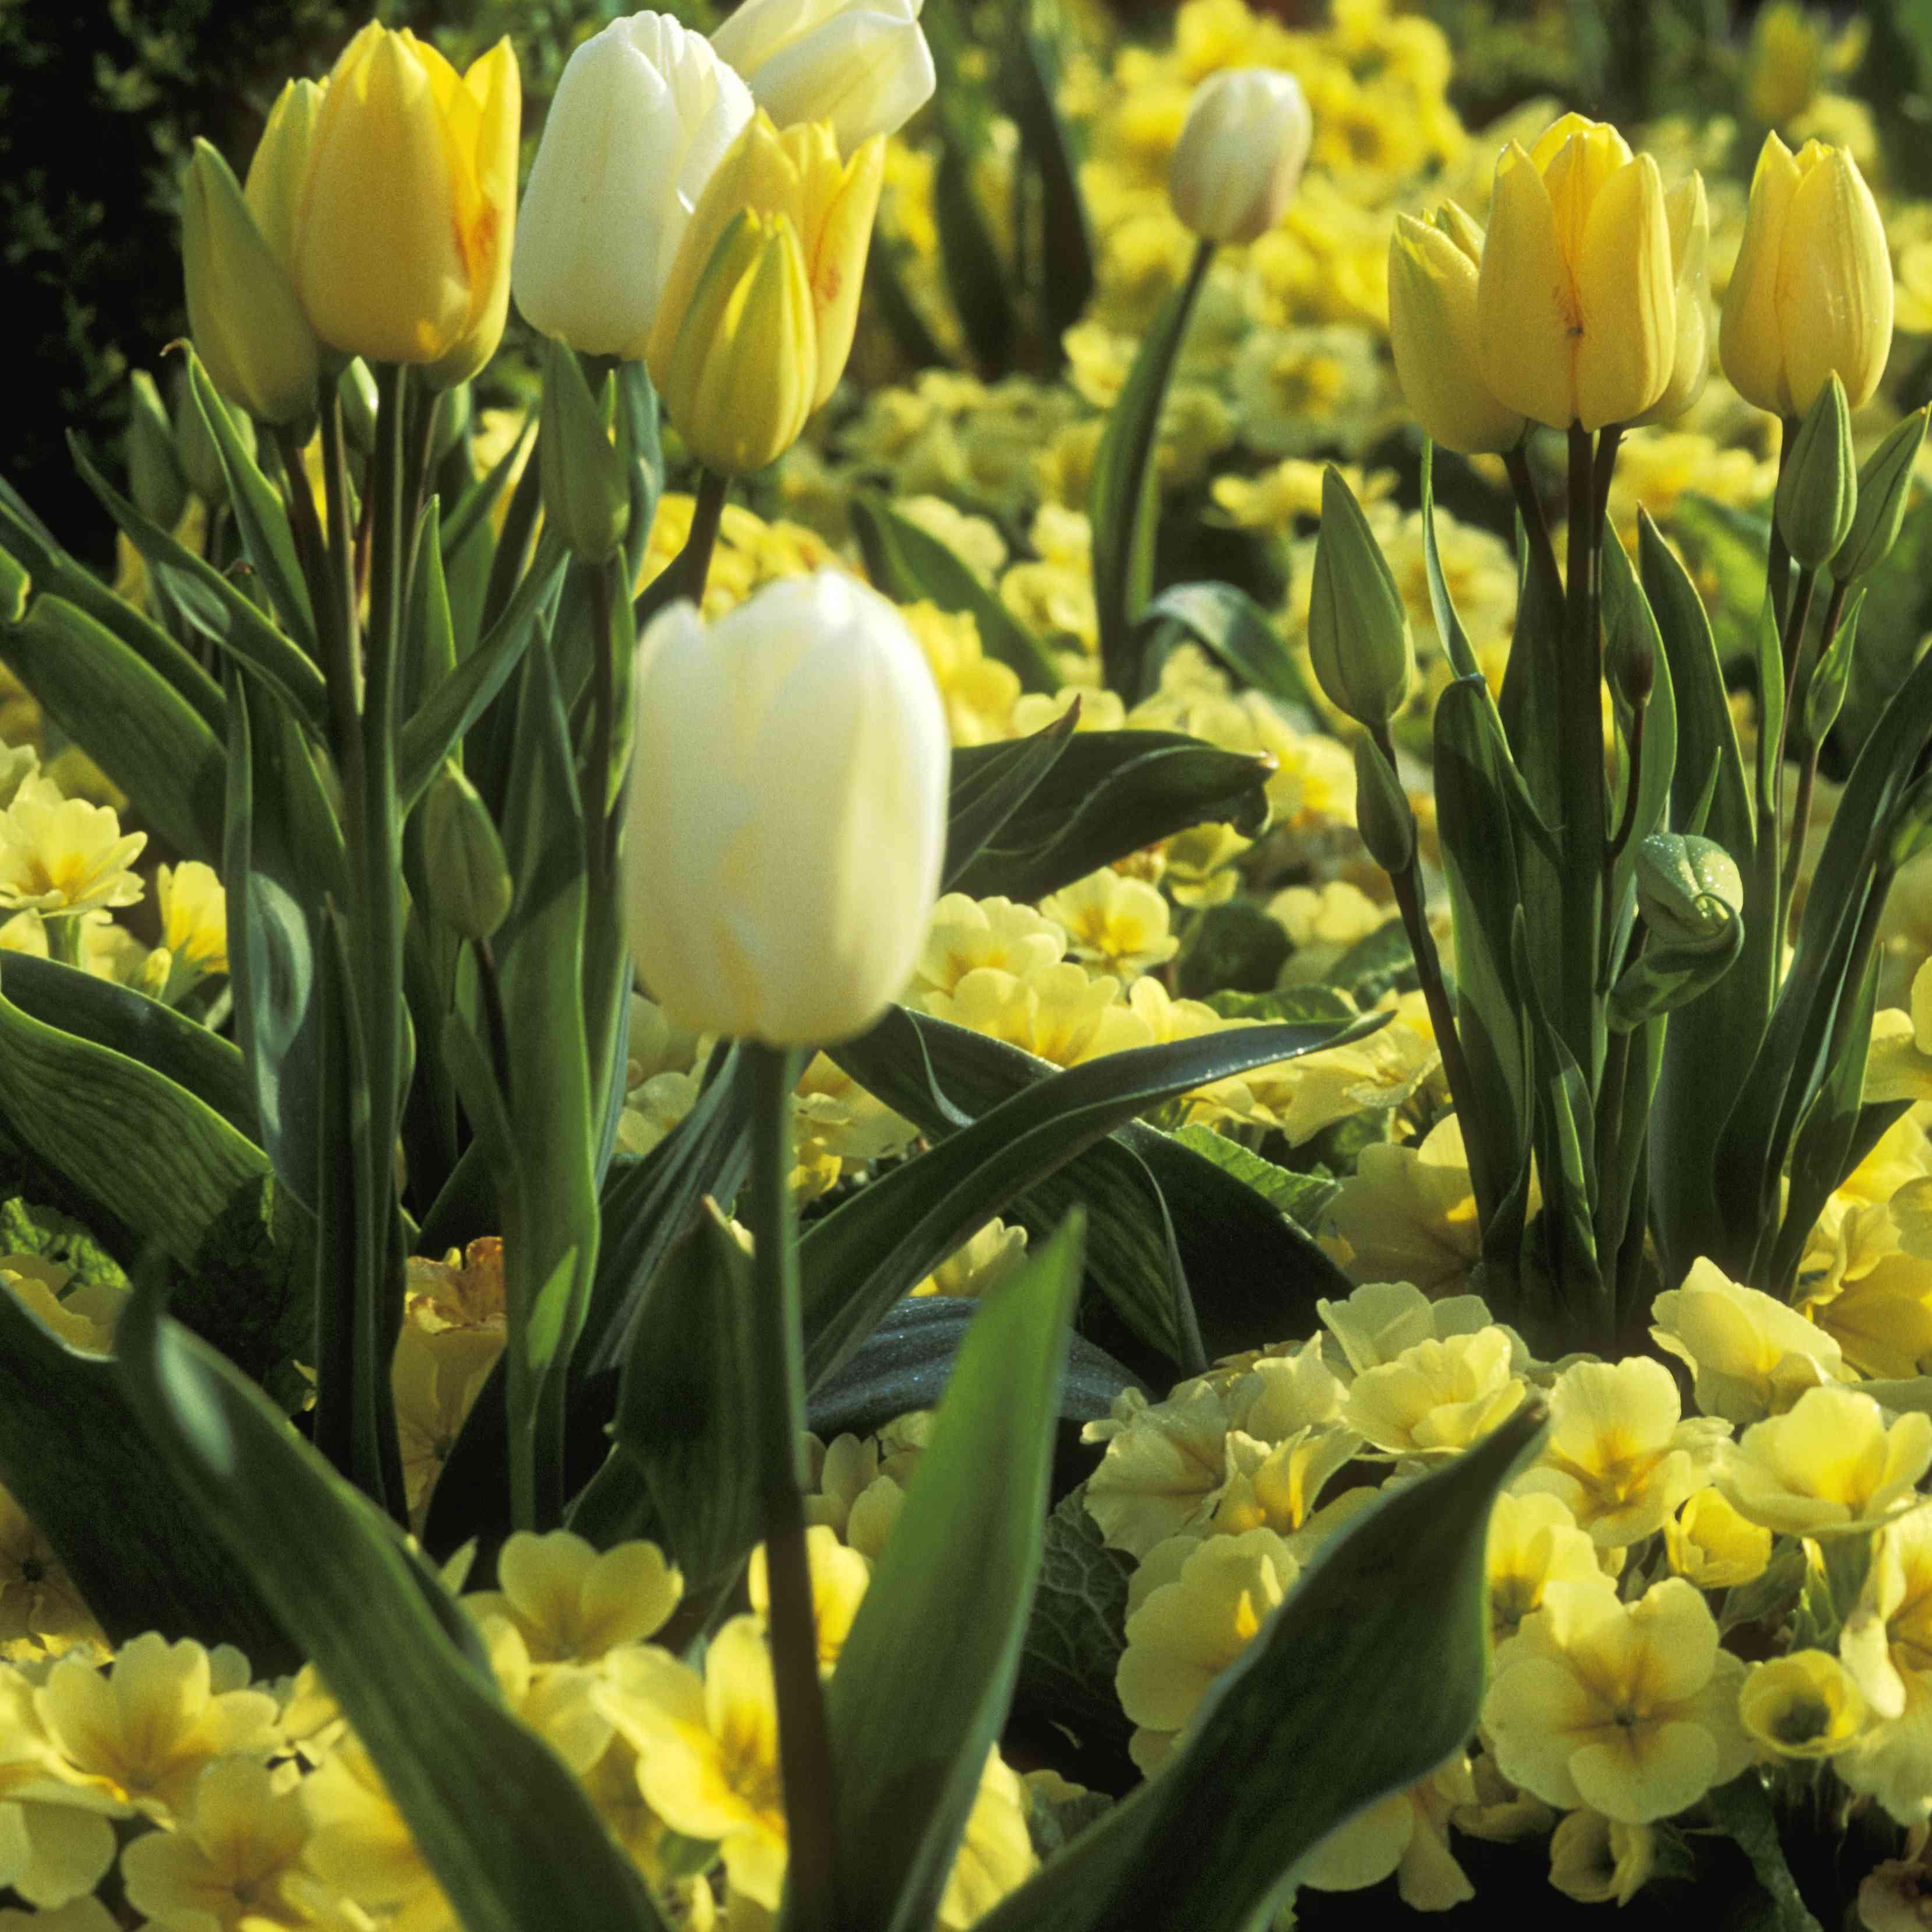 Tulips and Primroses